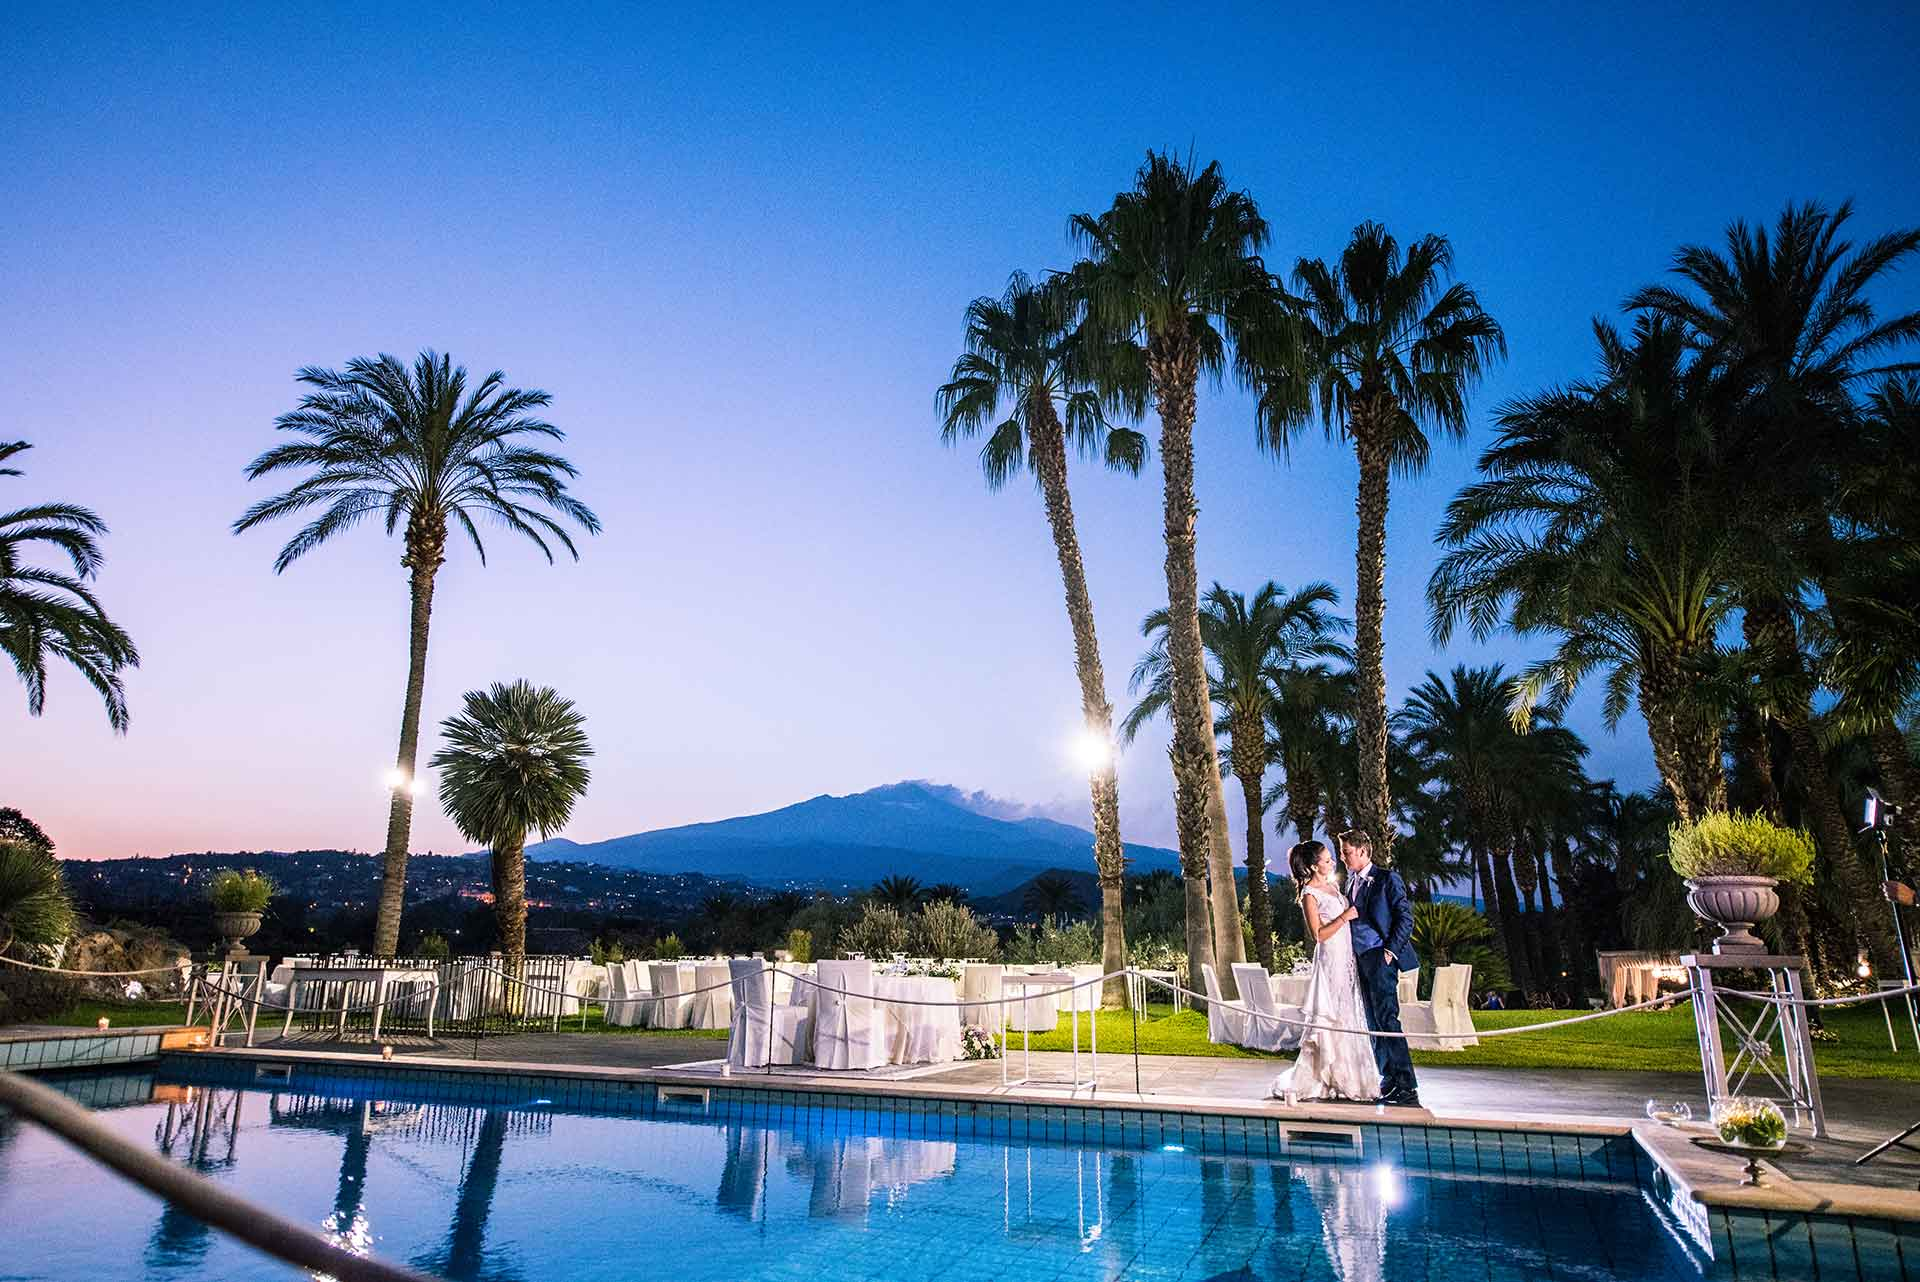 fotografie di matrimonio in sicilia